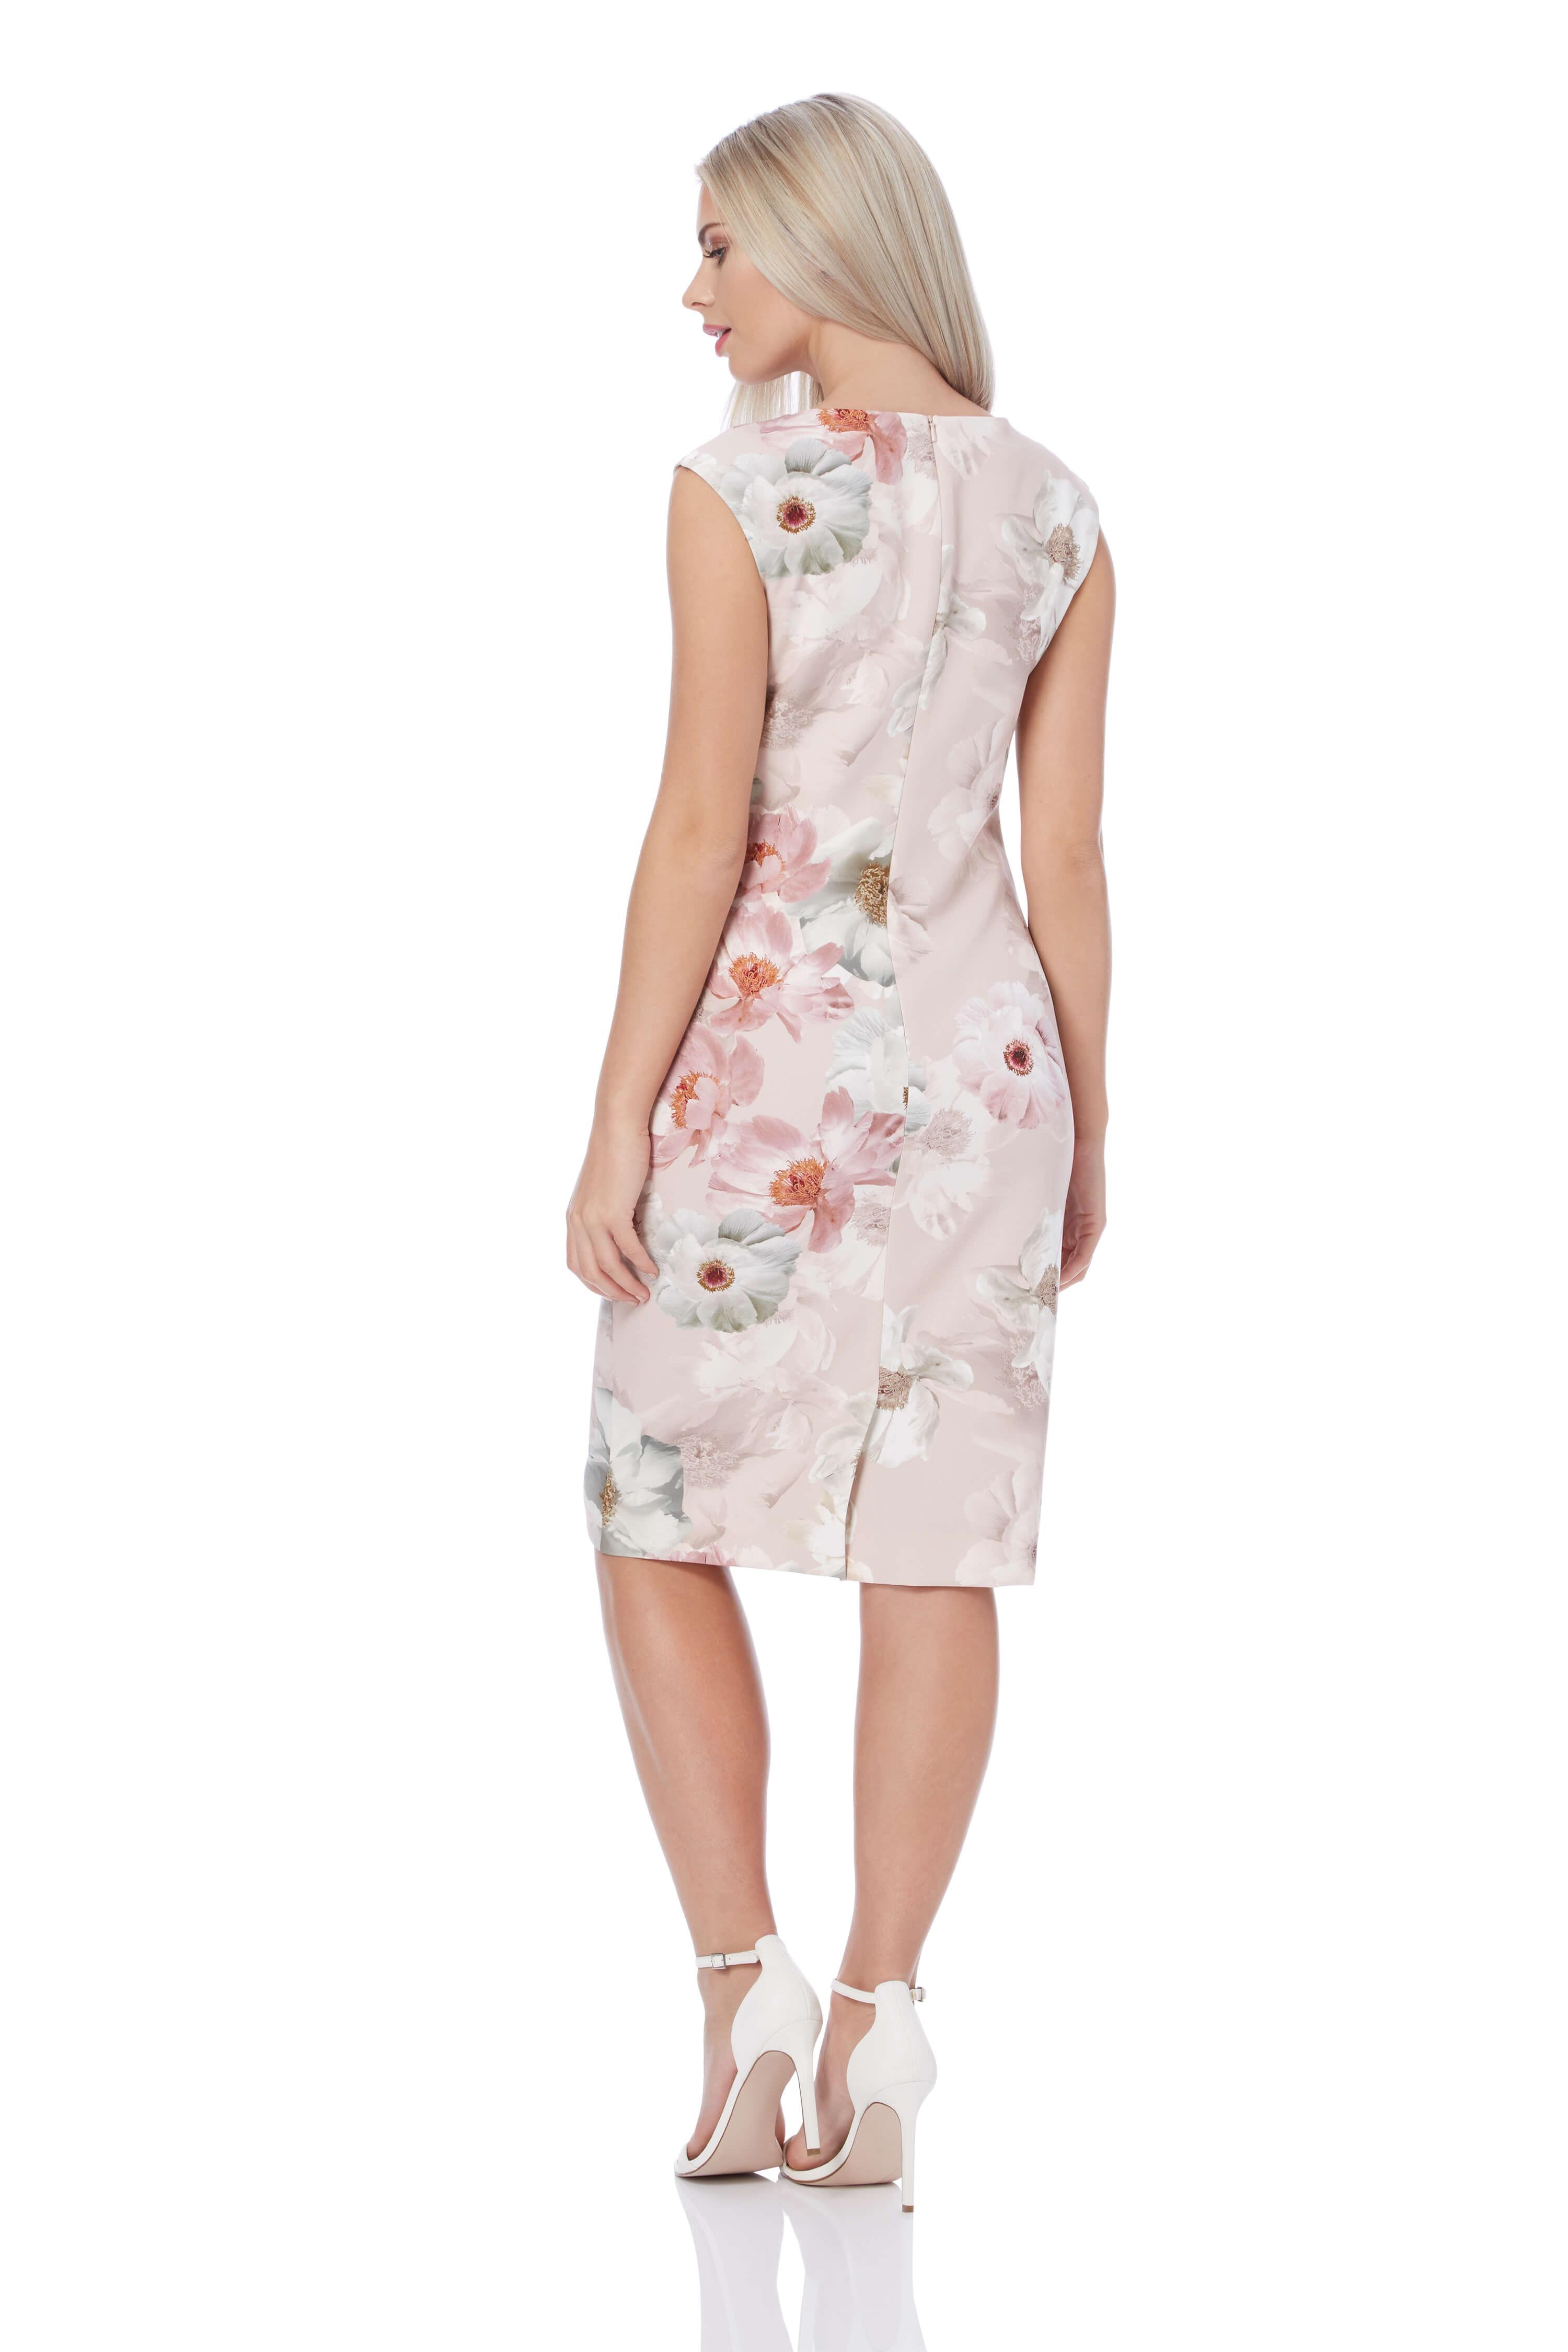 Roman-Originals-Womens-Light-Pink-Floral-All-Over-Print-Scuba-Dress-Sizes-10-20 thumbnail 14